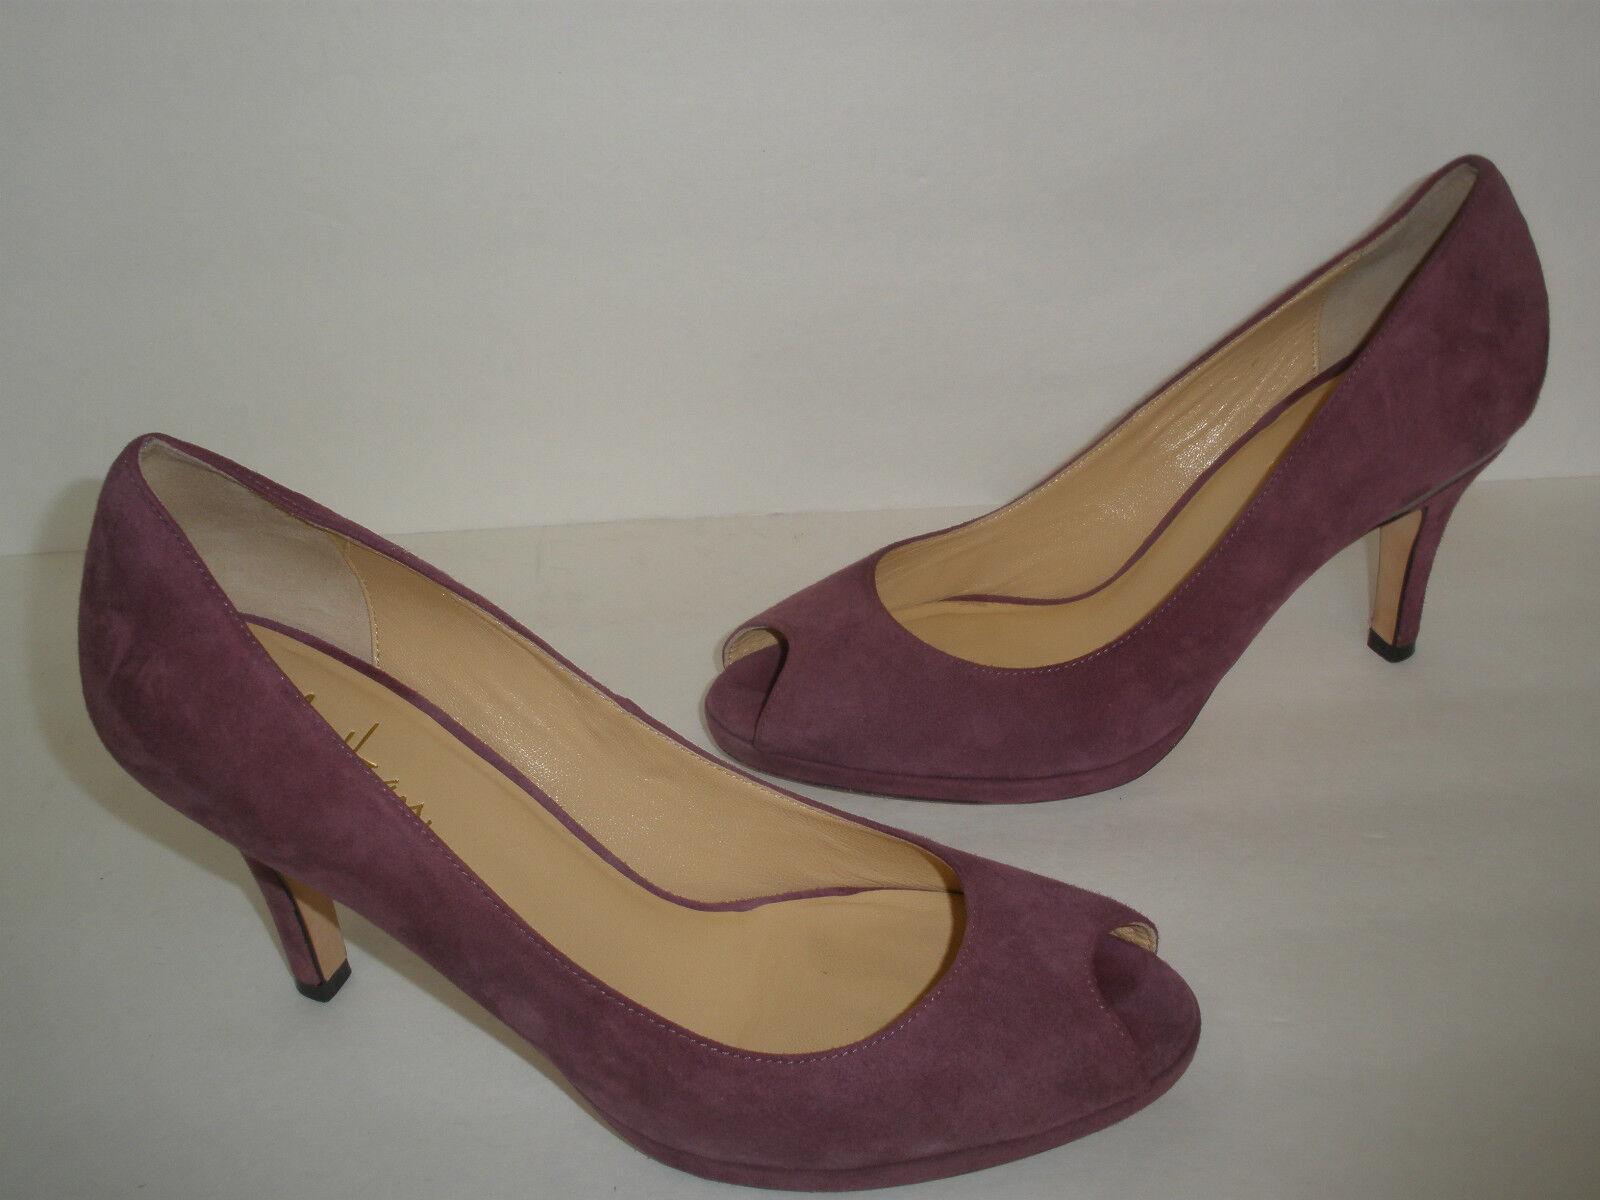 migliore offerta  274 COLE HAAN  CARMA  NIKE NIKE NIKE AIR LEATHER PUMPS scarpe viola US 8.5  pep toe nice  per il commercio all'ingrosso